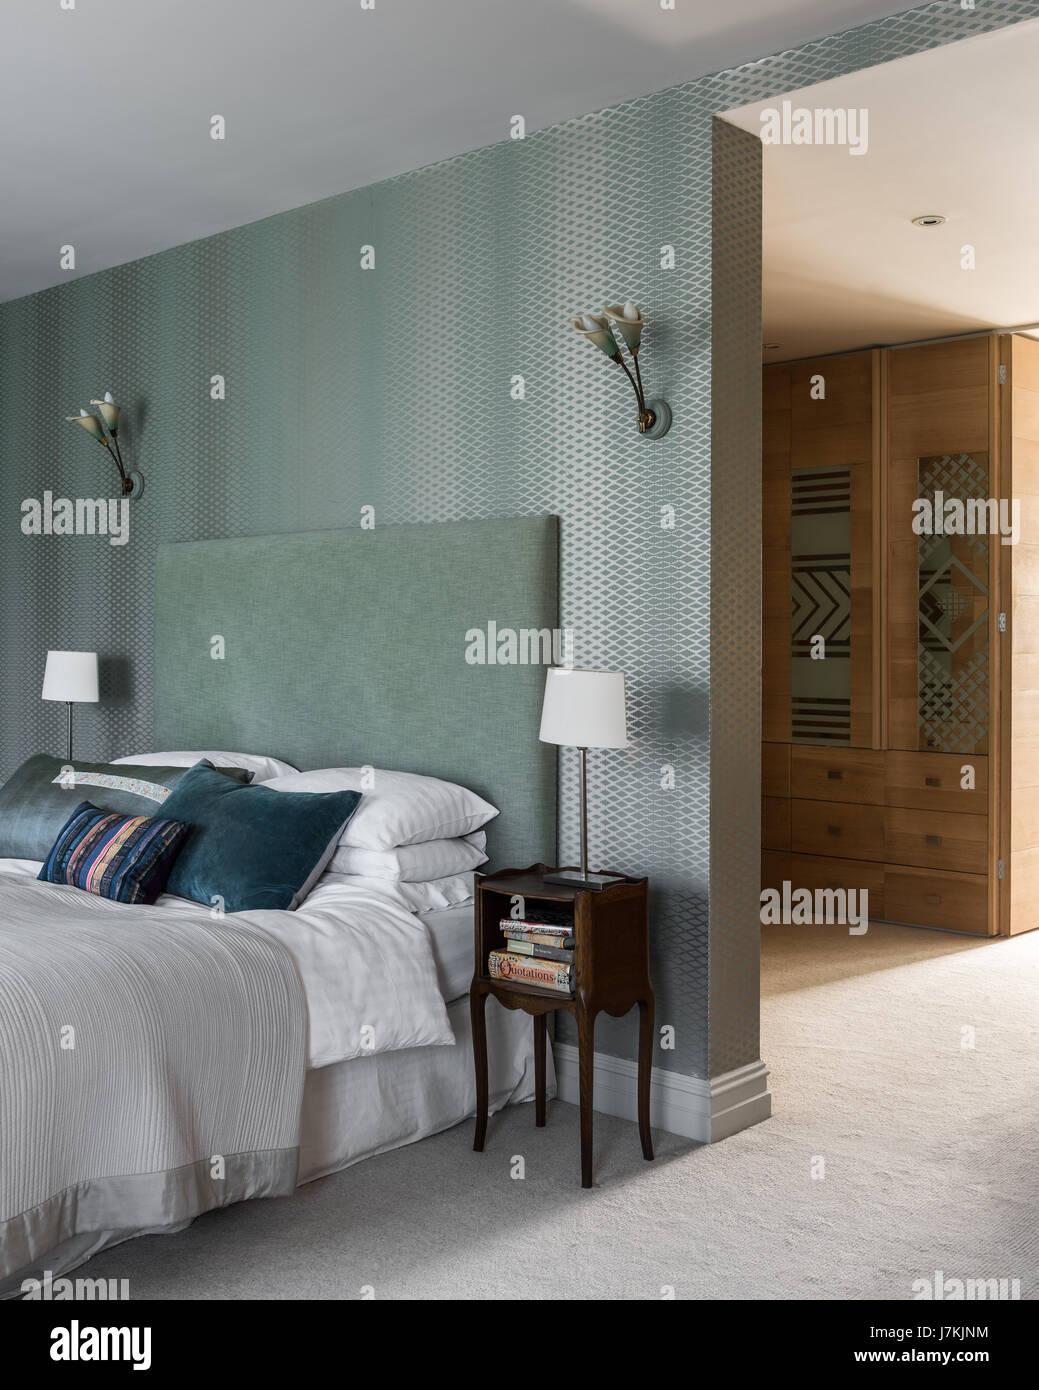 Farrow & Ball Gitter Tapete im Schlafzimmer mit grünen Kopfteil ...